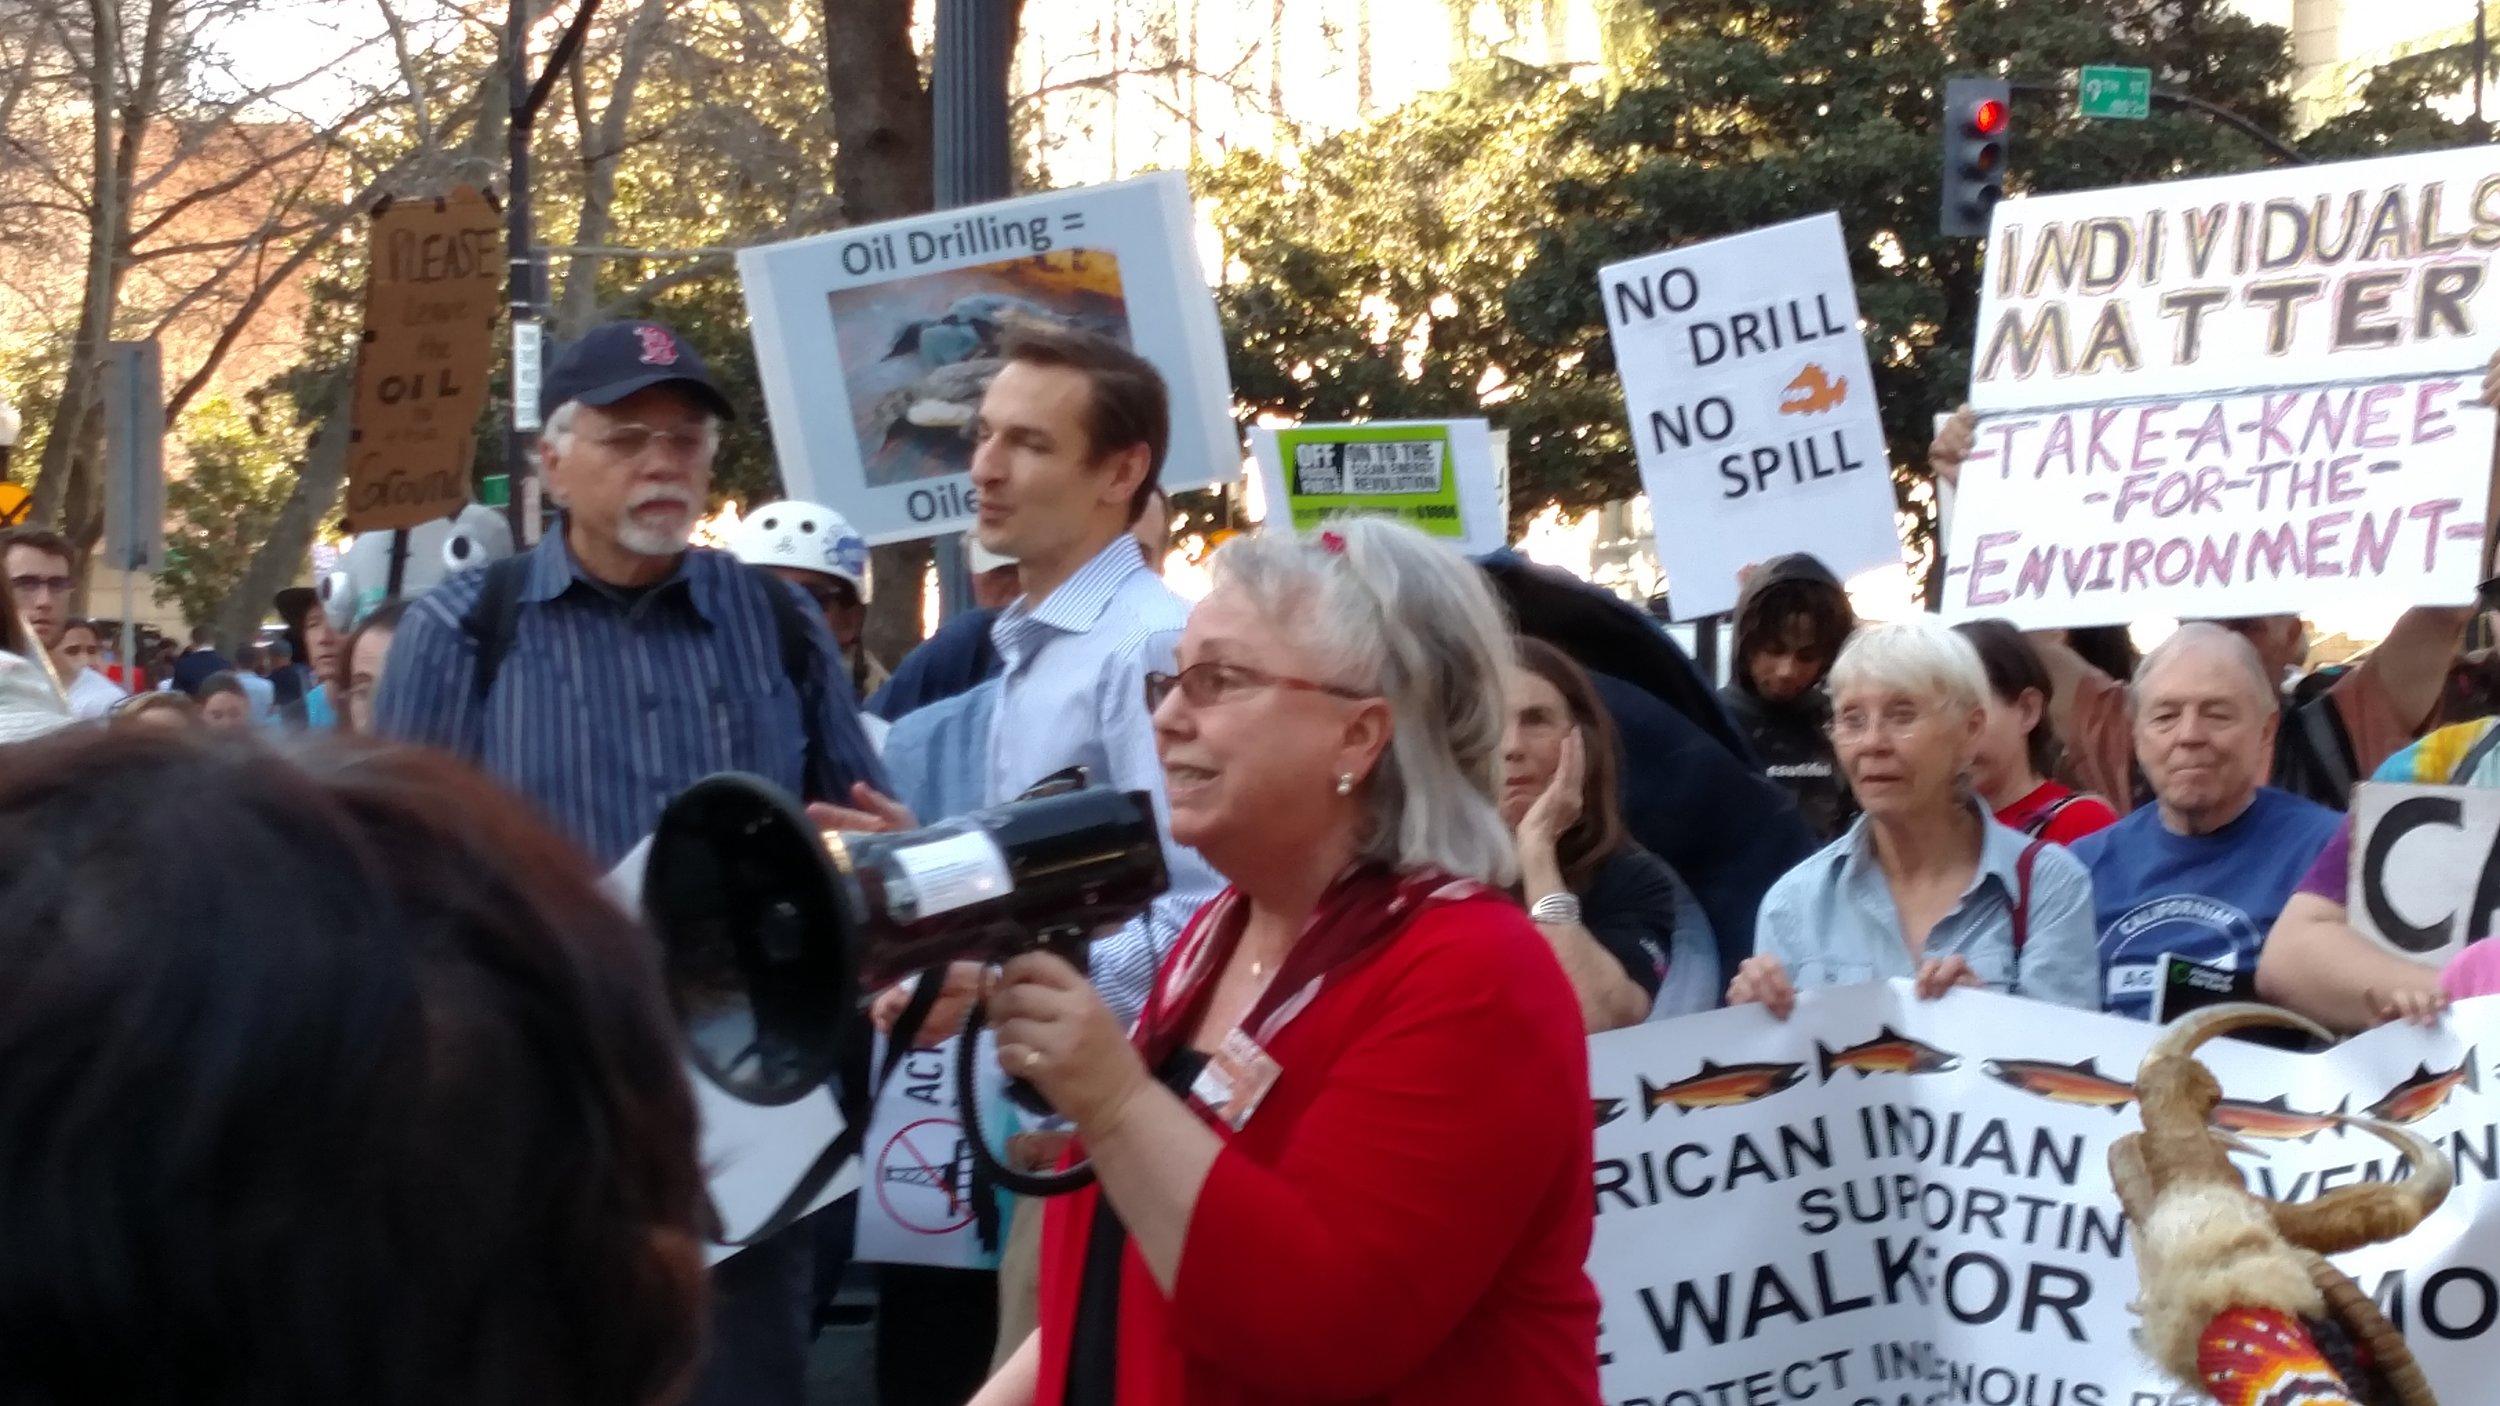 Demonstrators gather outside Sacramento. [photo credit: Gabrielle Dolphin]